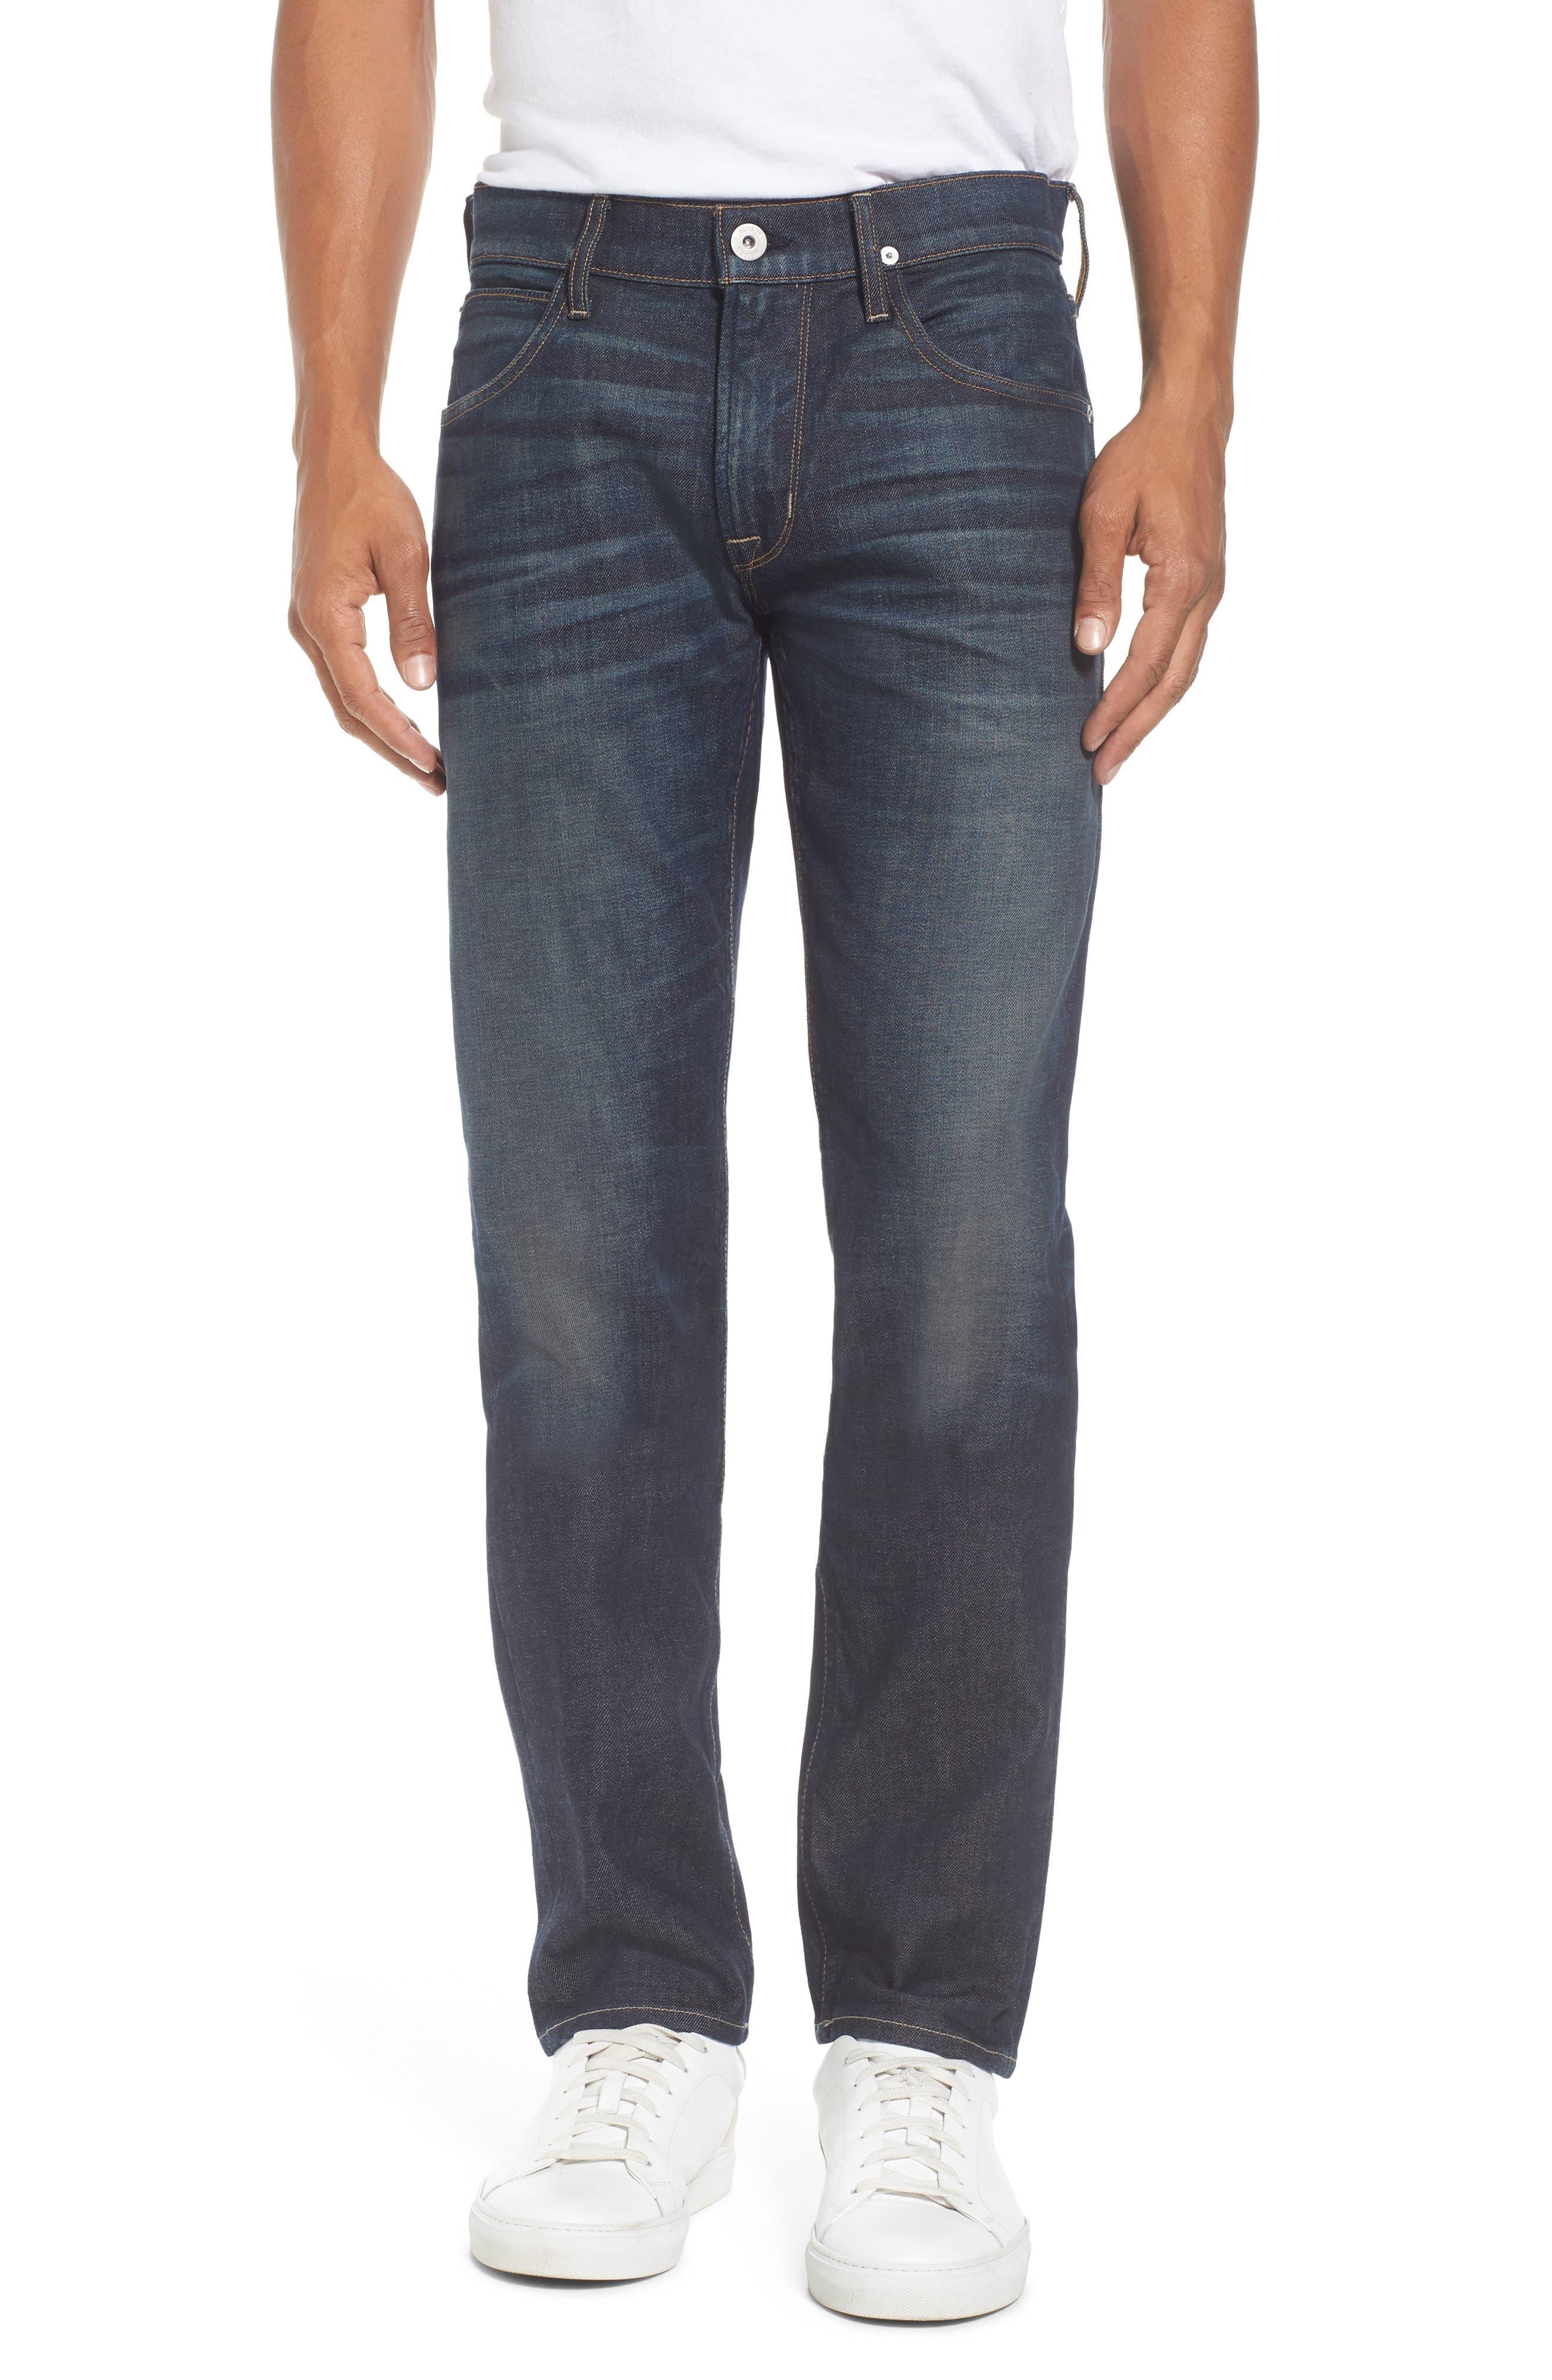 Blake Slim Fit Jeans,                             Main thumbnail 1, color,                             420